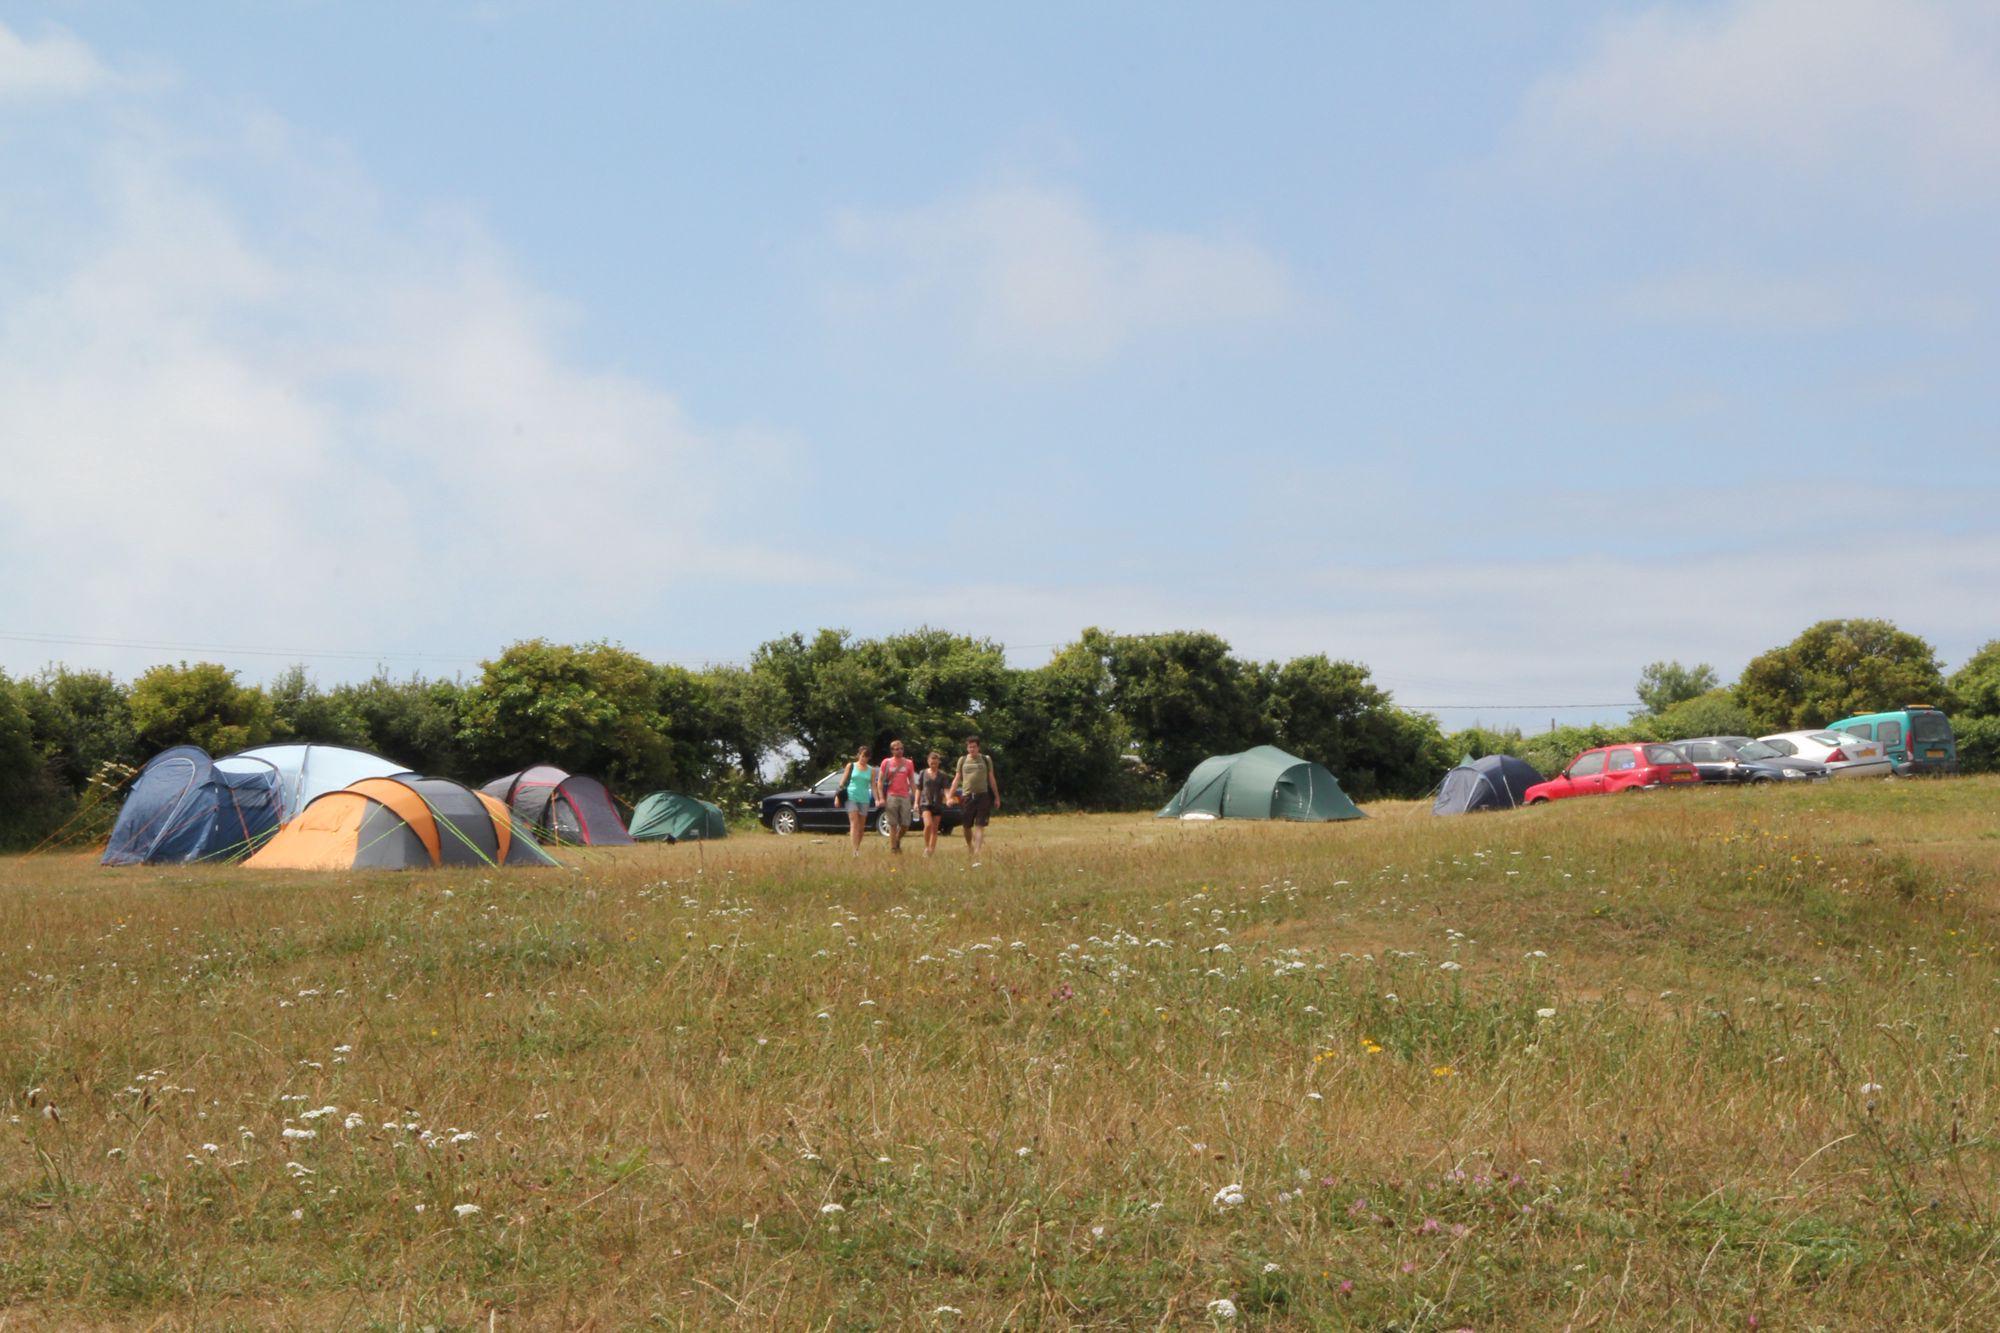 Acton Field